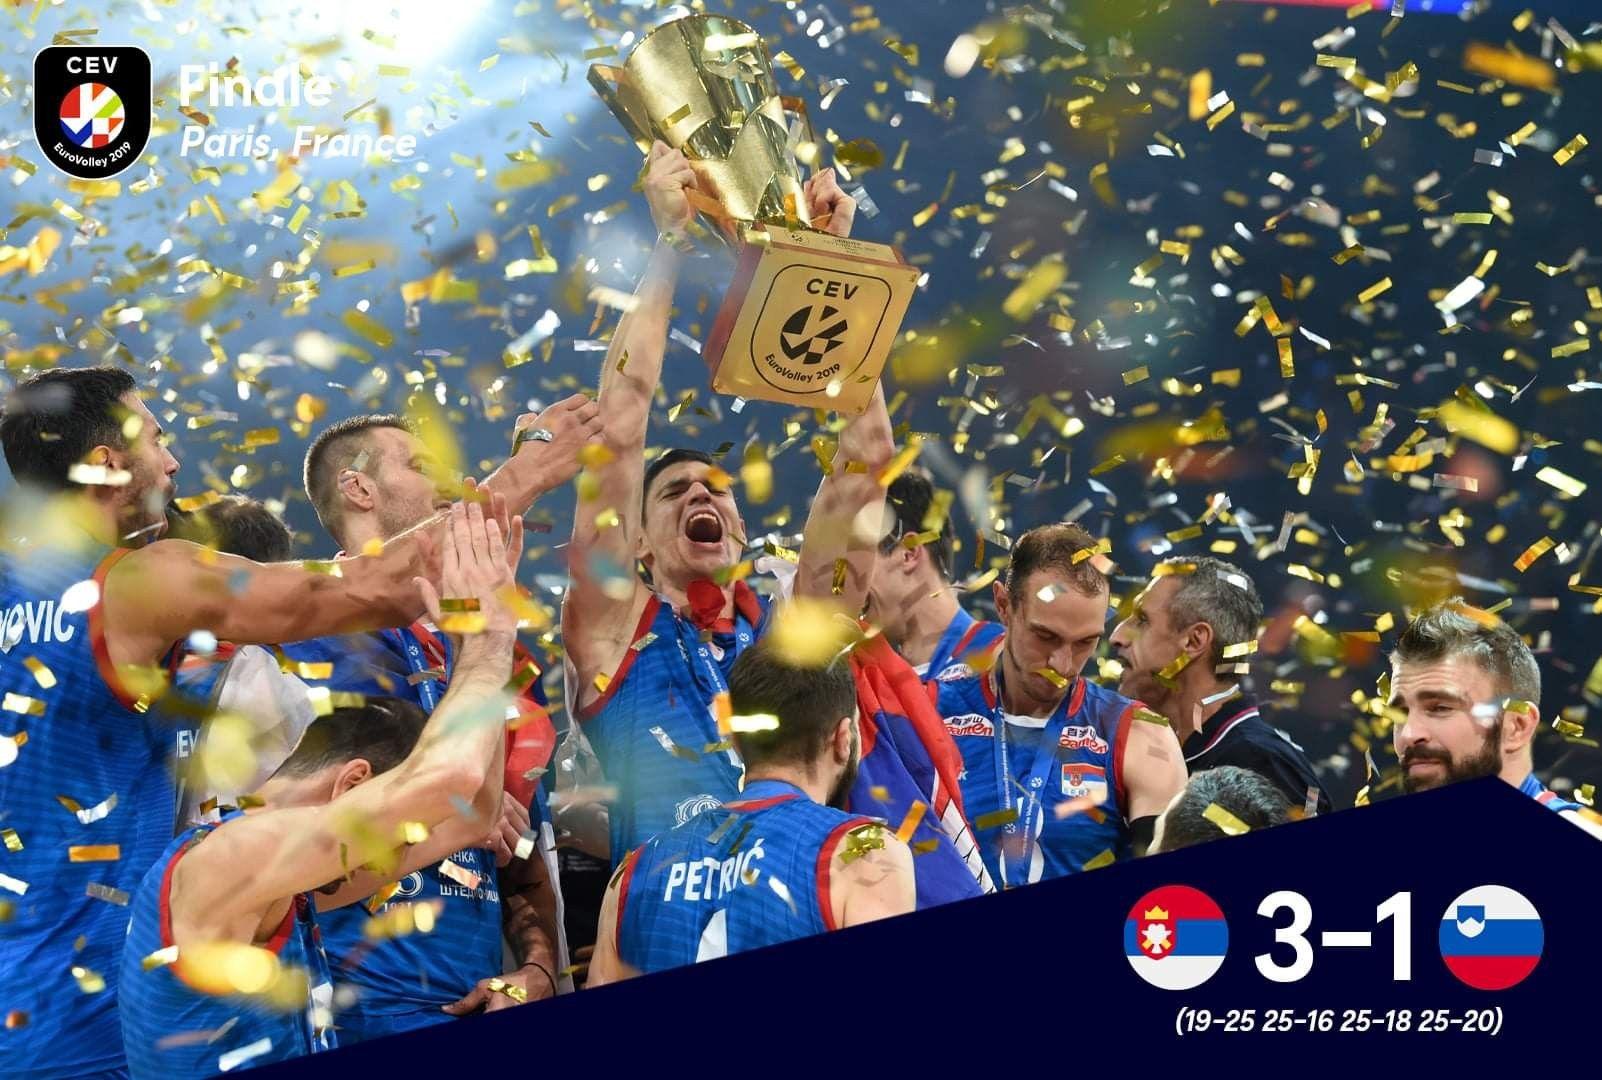 Serbia Man S Volleyball Team Champions 2019 Eurovolleym Serbia Mens Volleyball Volleyball Team